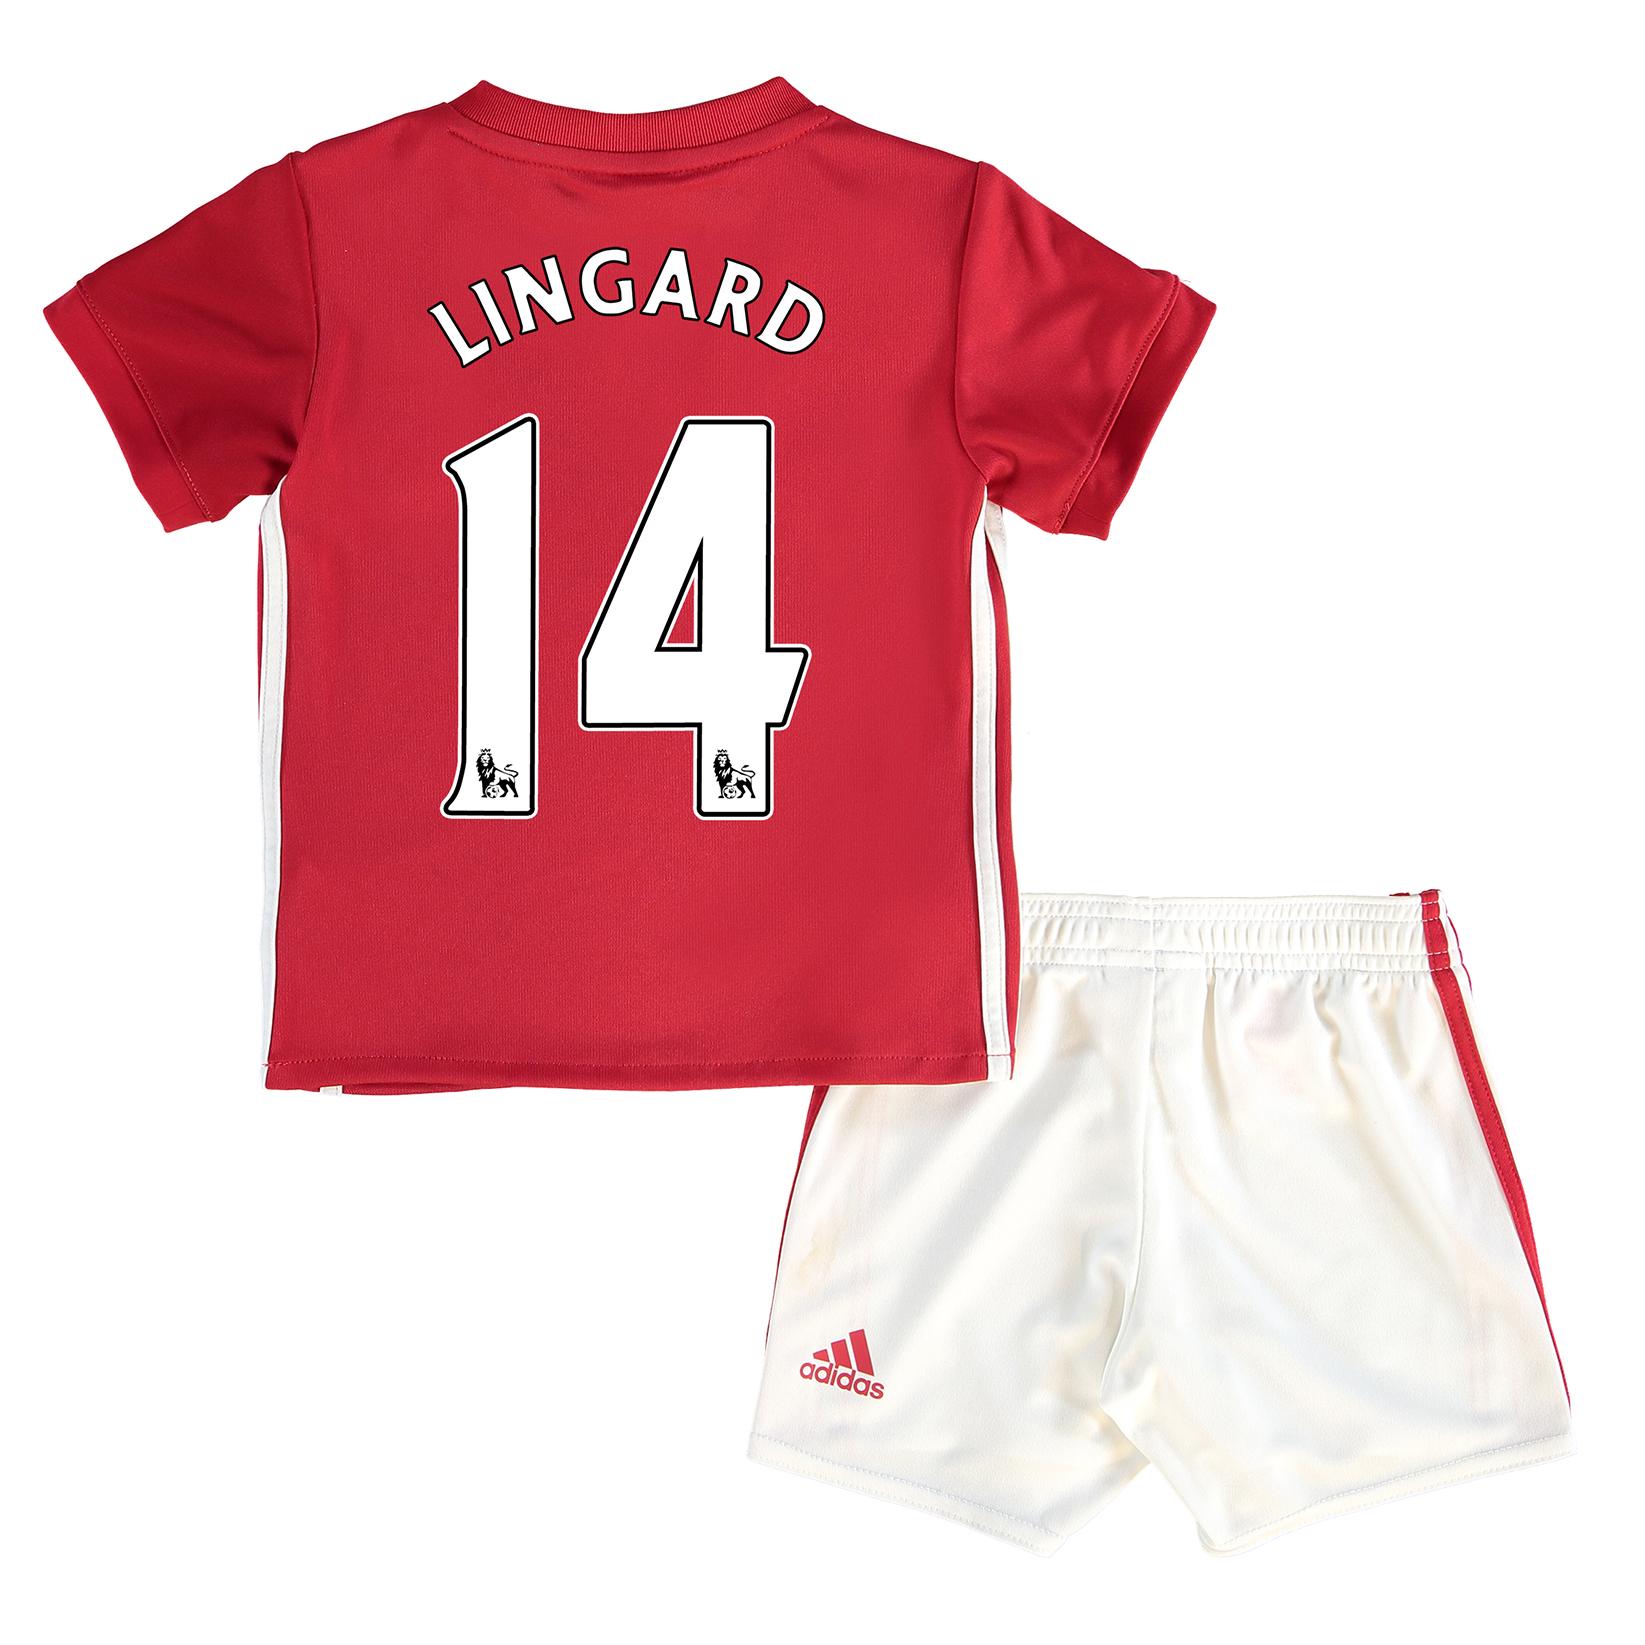 Baby kit Manchester United Domicile 2016-17 - Lingard 14